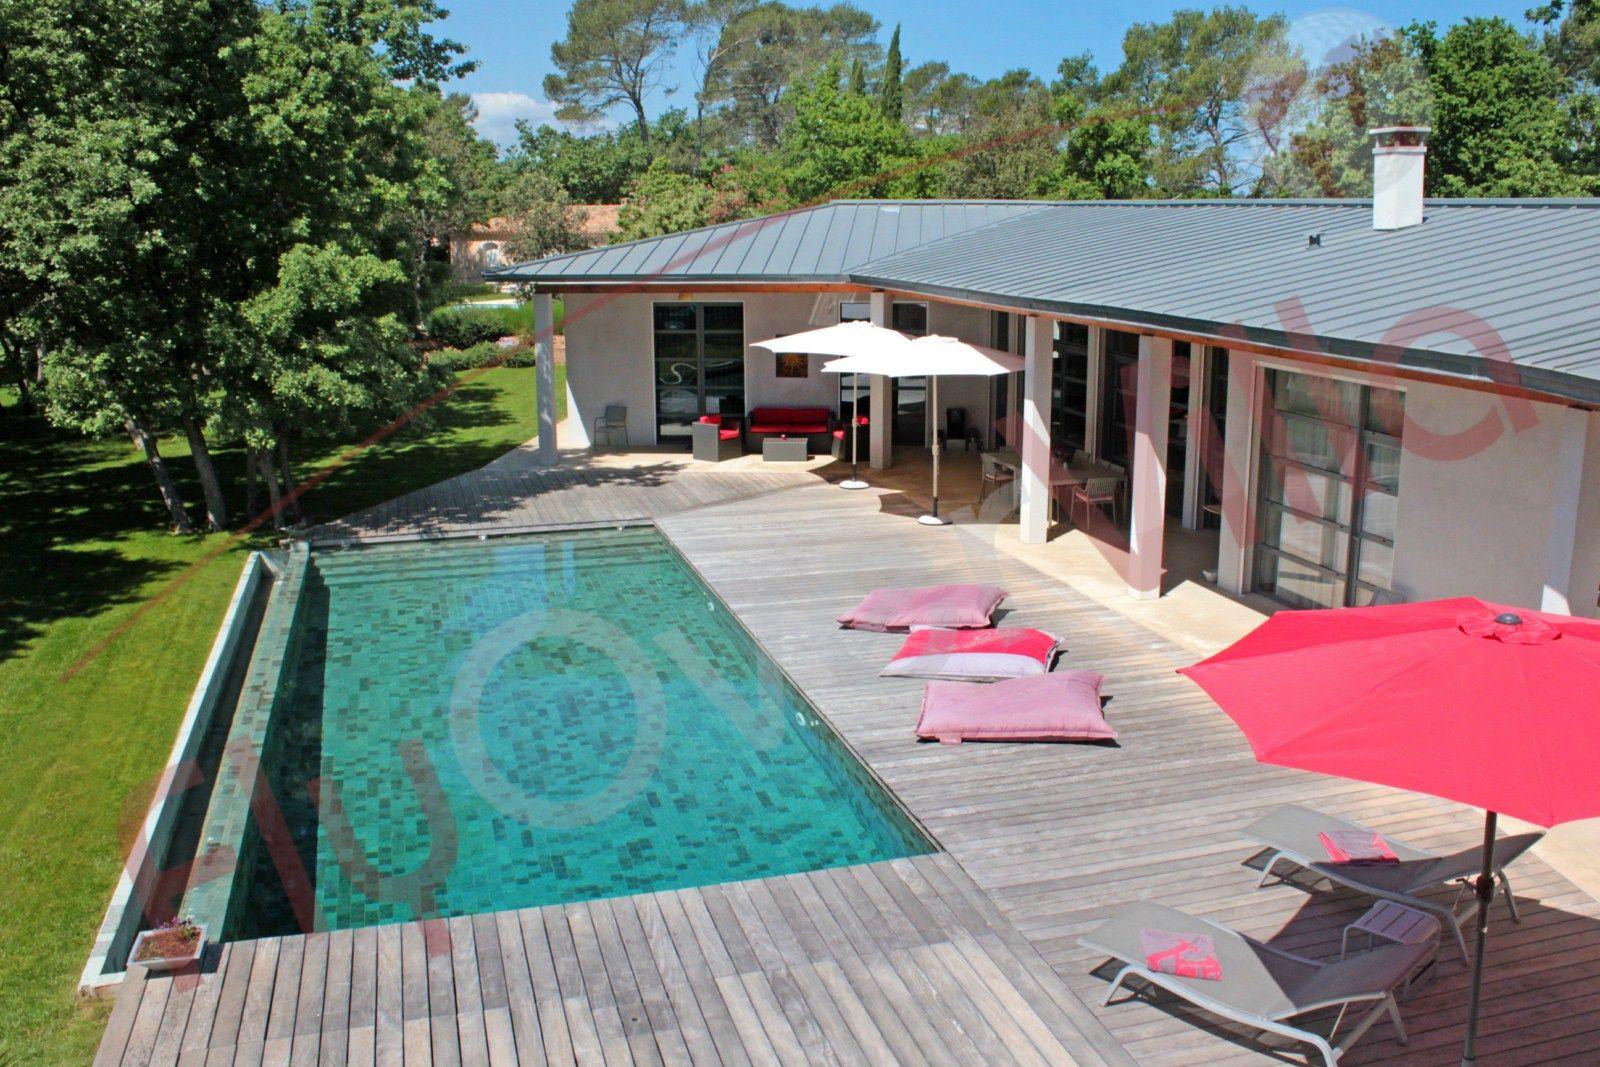 La piscine aquaset piscines traditionnelles brignoles for Constructeur piscine beton var